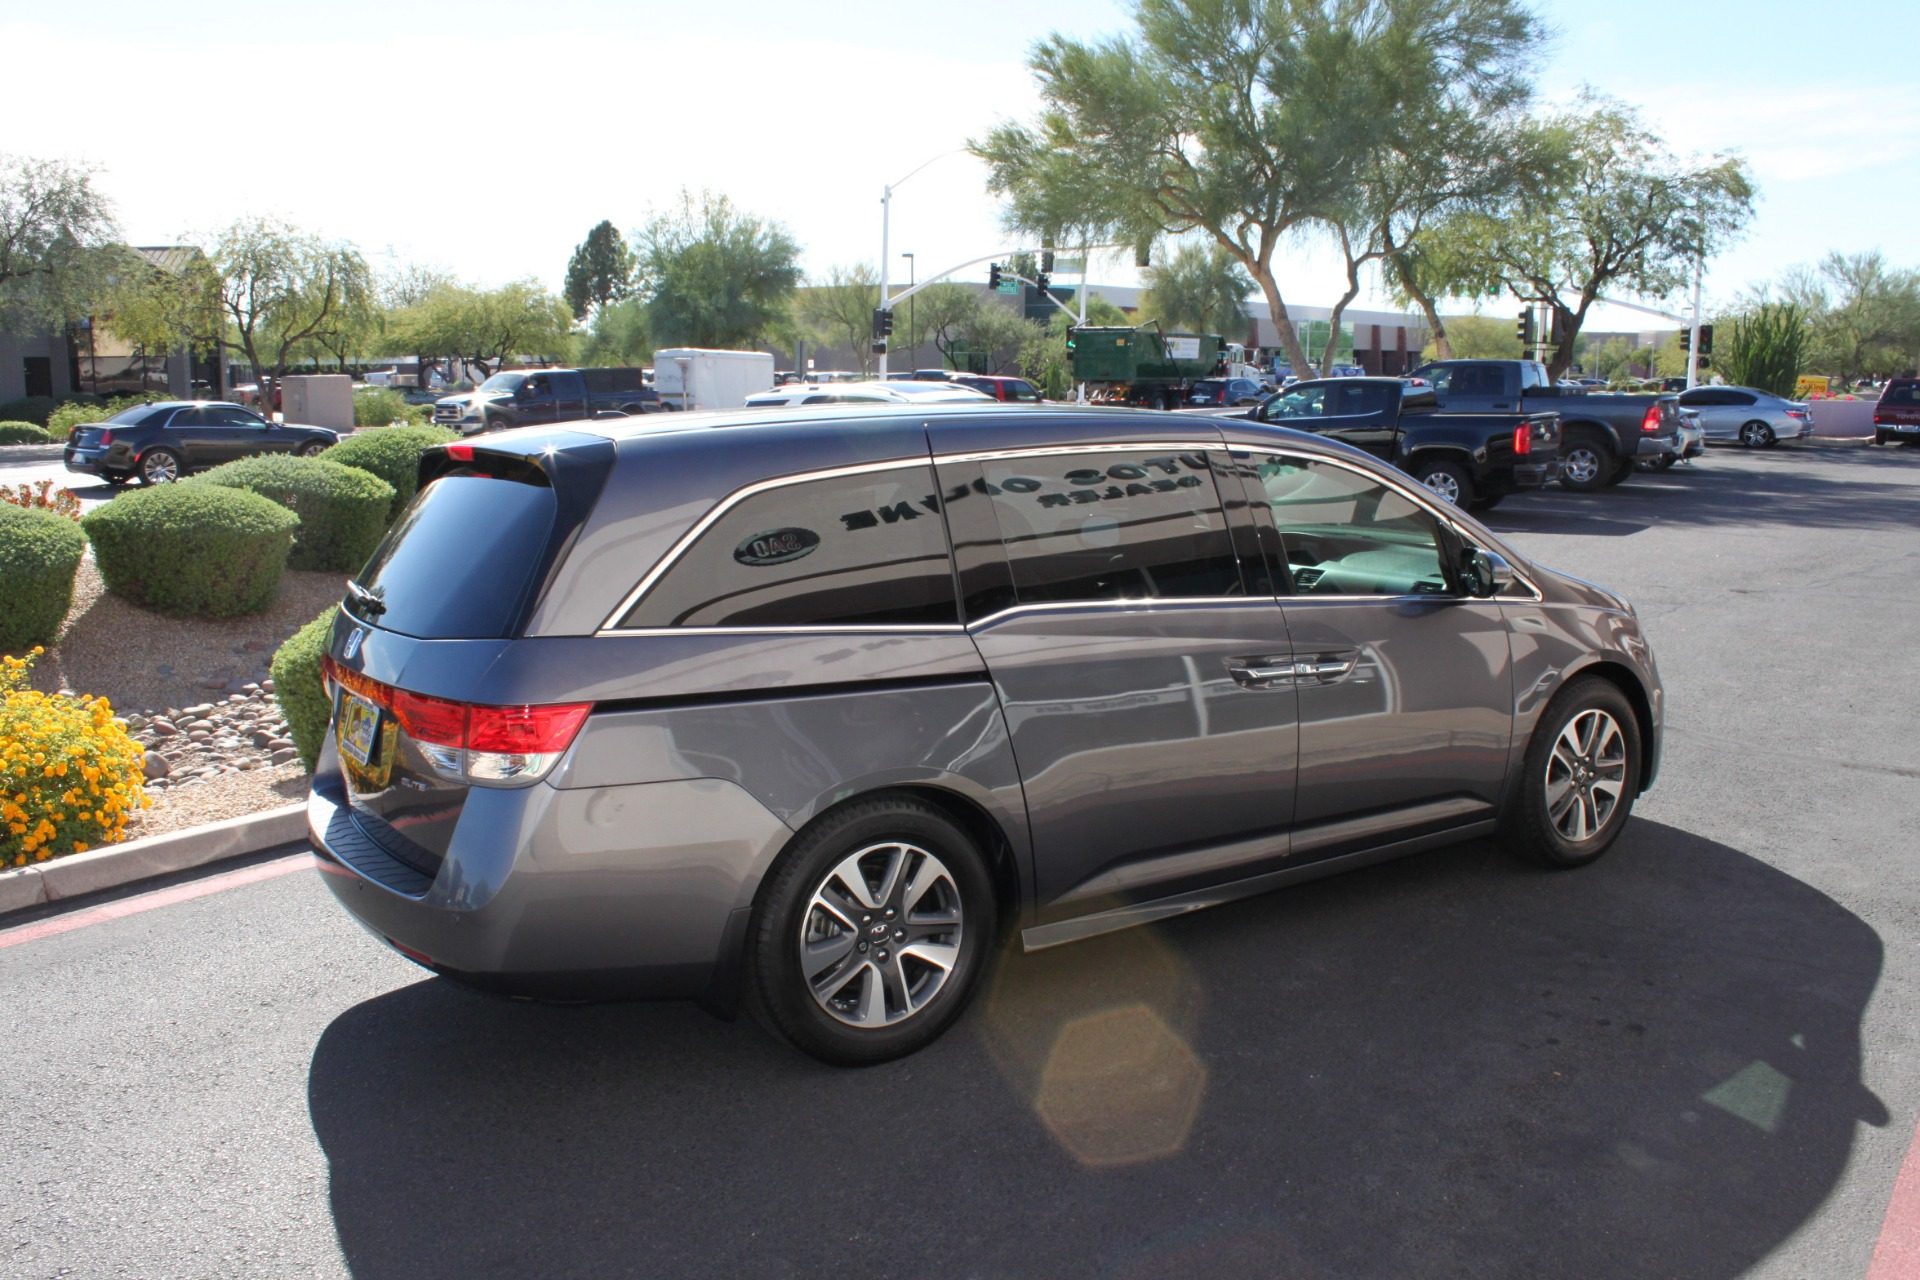 Used-2016-Honda-Odyssey-Touring-Elite-LS400